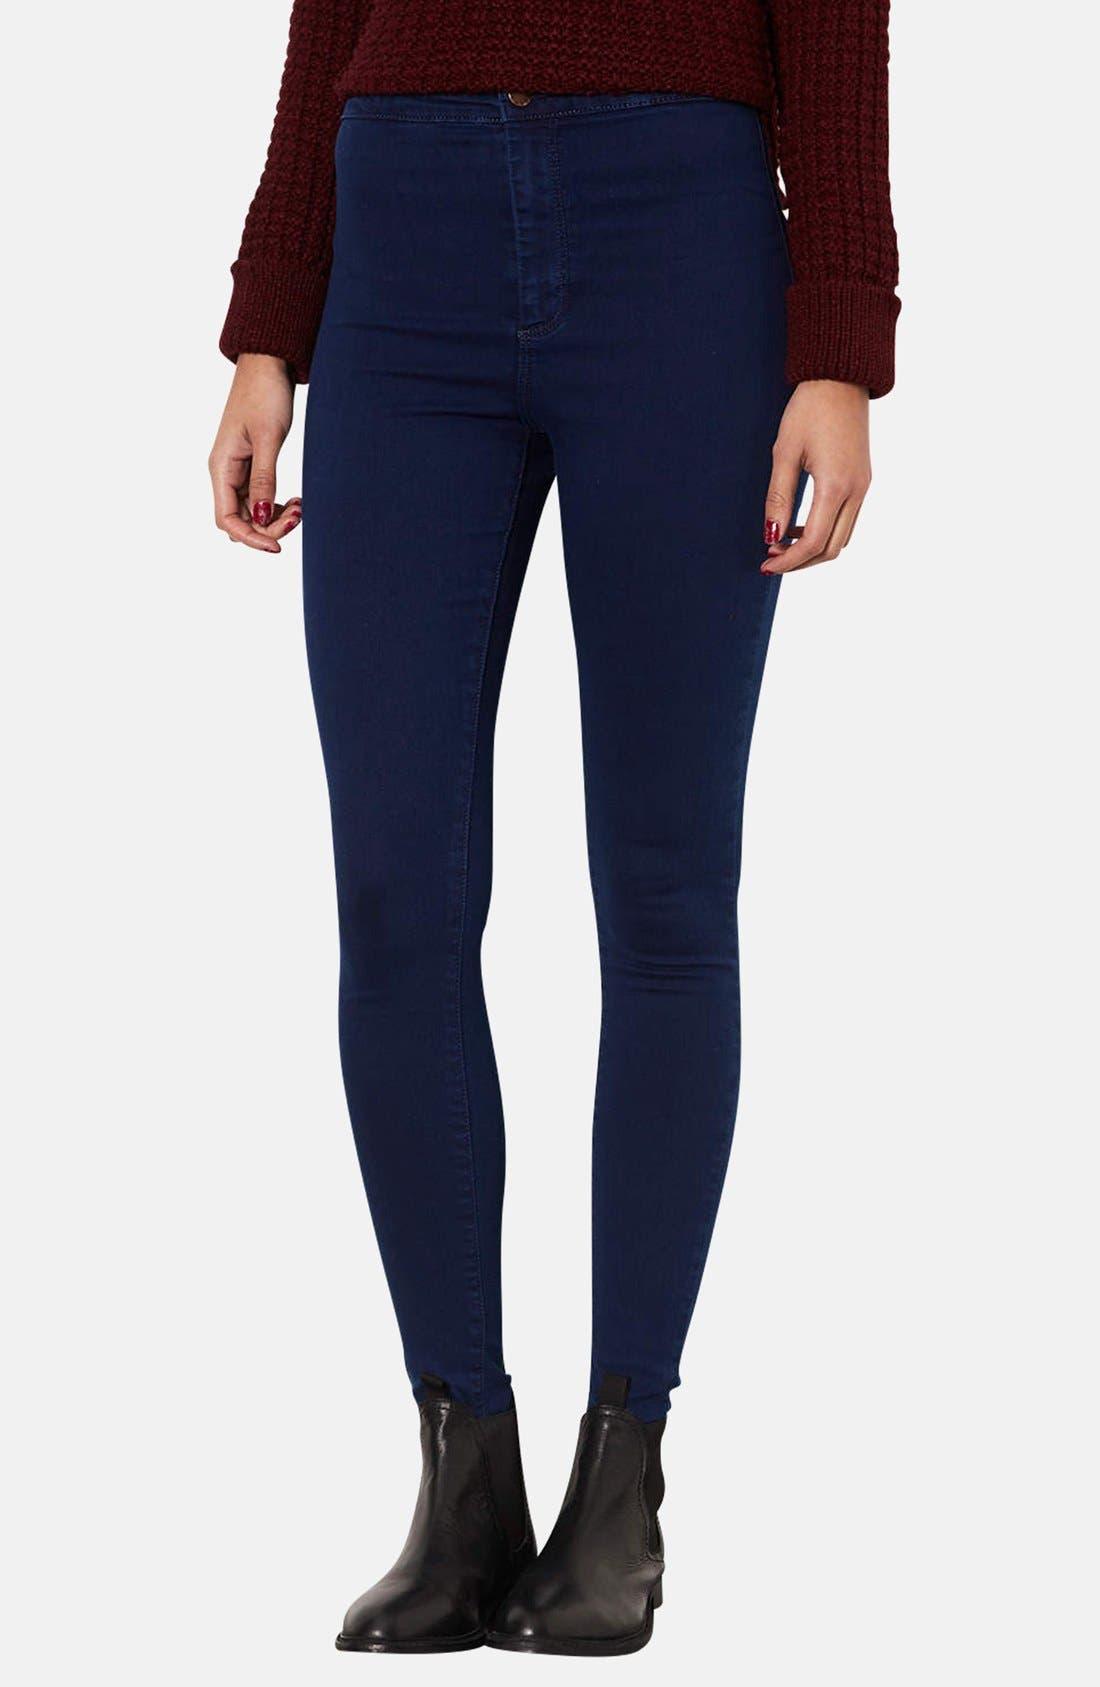 Alternate Image 1 Selected - Topshop Moto 'Joni' High Rise Skinny Jeans (Blue) (Short)